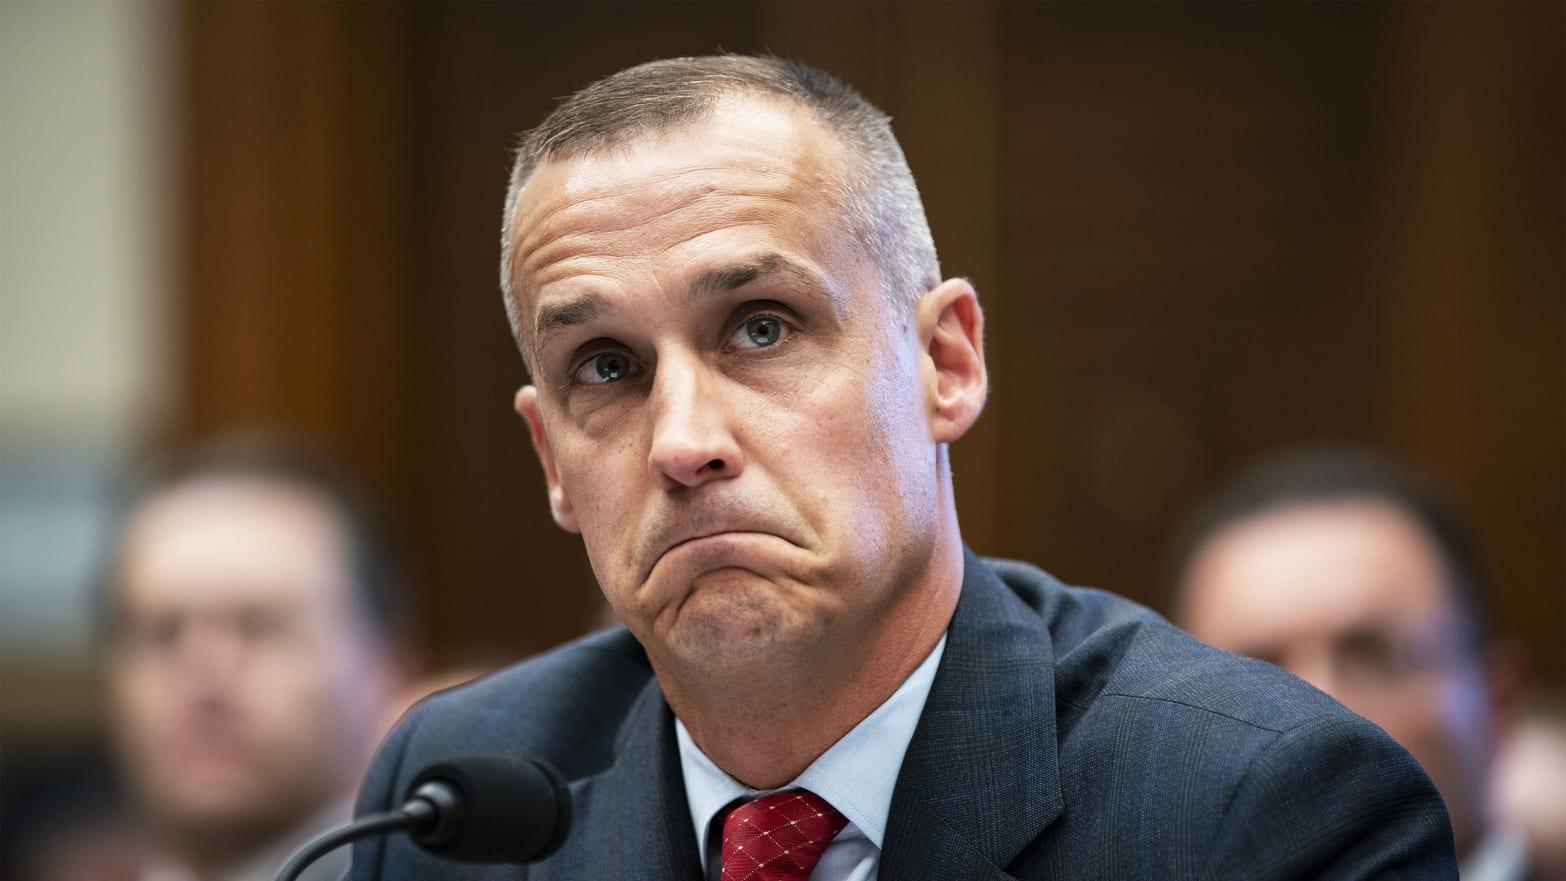 Corey Lewandowski's House Testimony Was Basically His Senate Campaign Launch